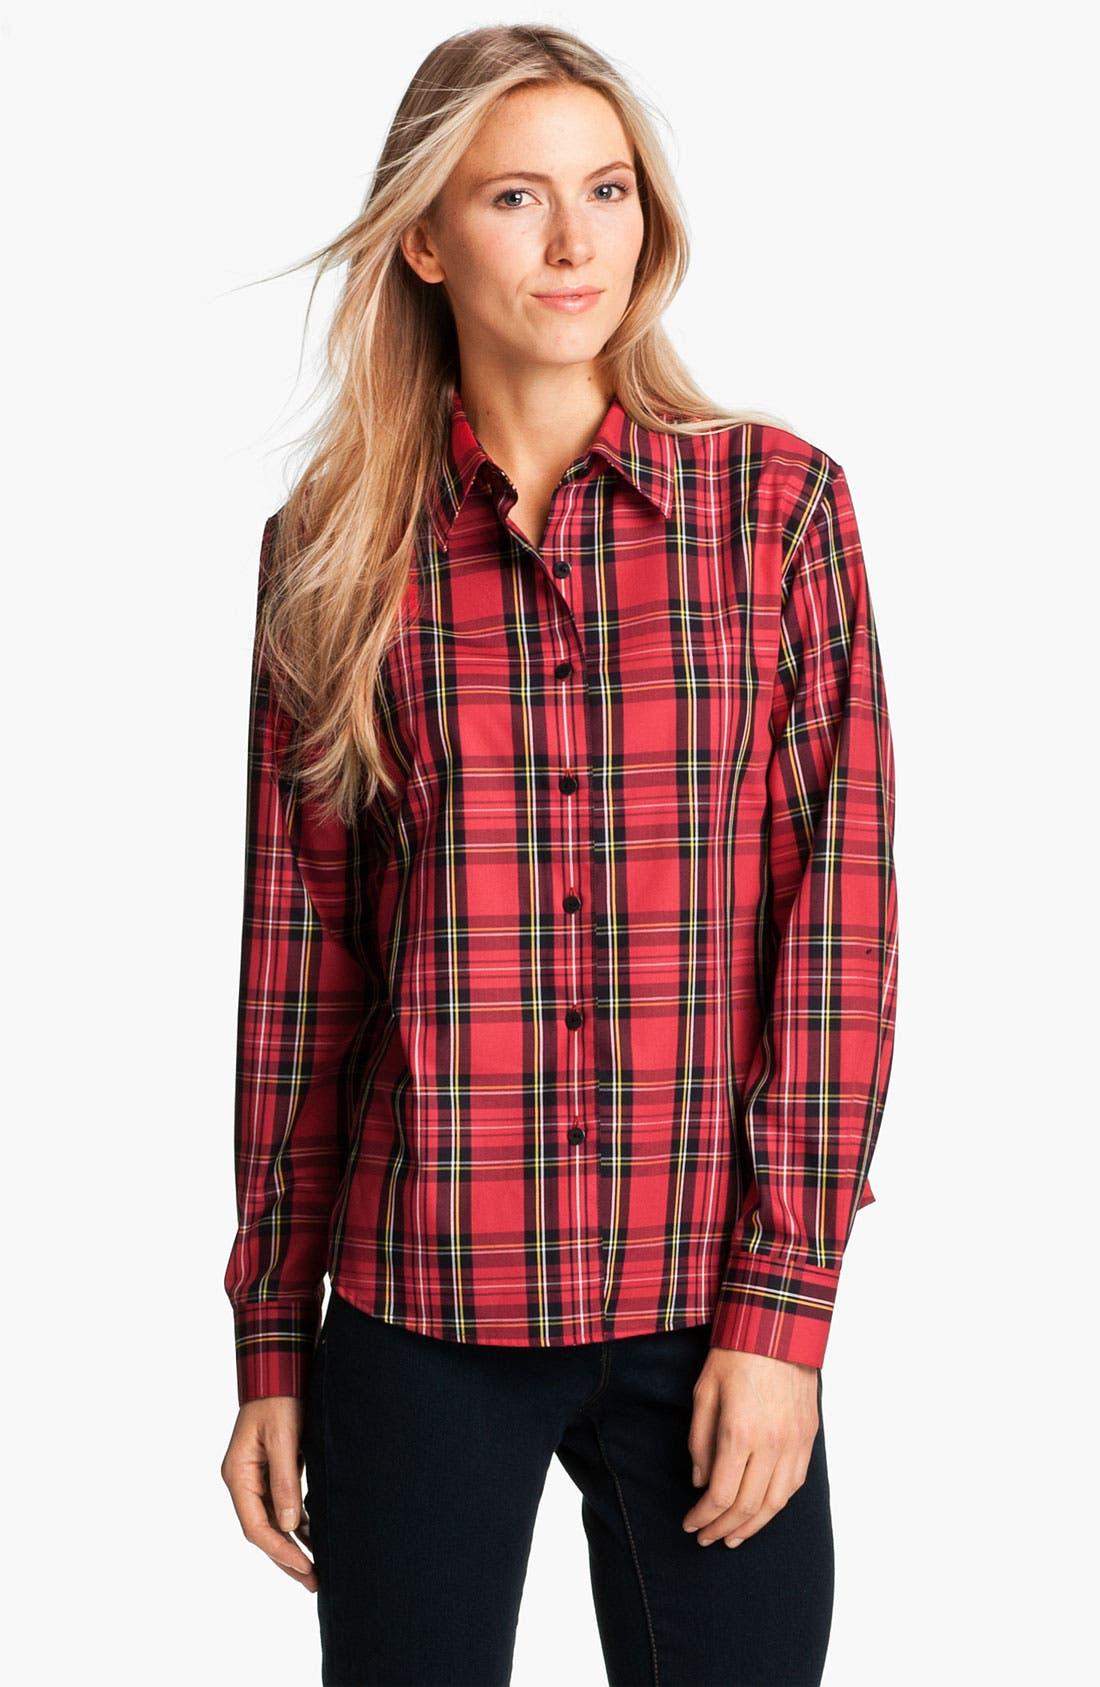 Alternate Image 1 Selected - Foxcroft 'Classic Tartan' Shirt (Petite)